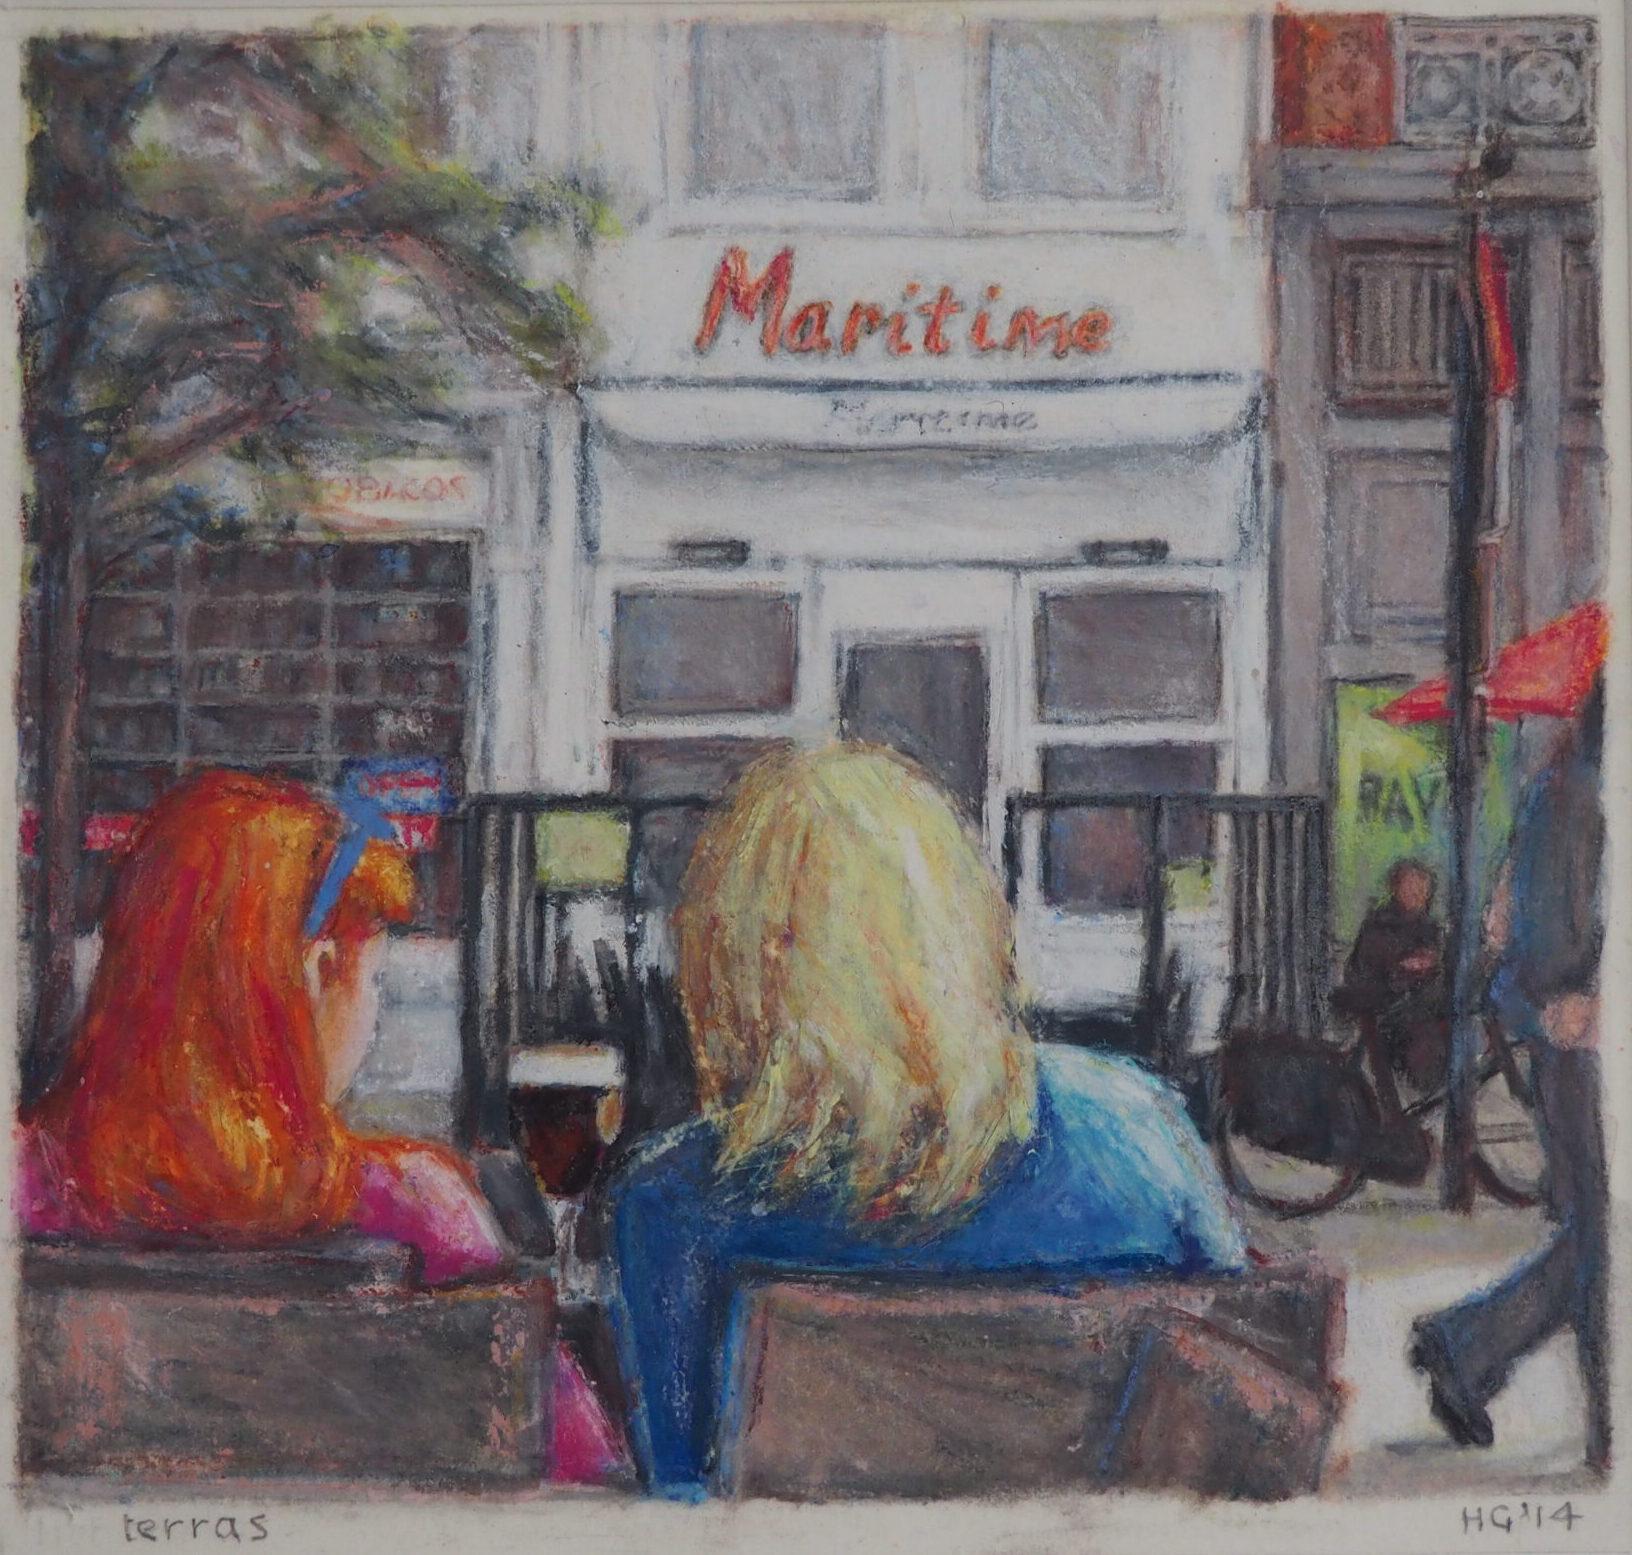 37.Hetty-Geursen_mo4_Maritime-terras-dames